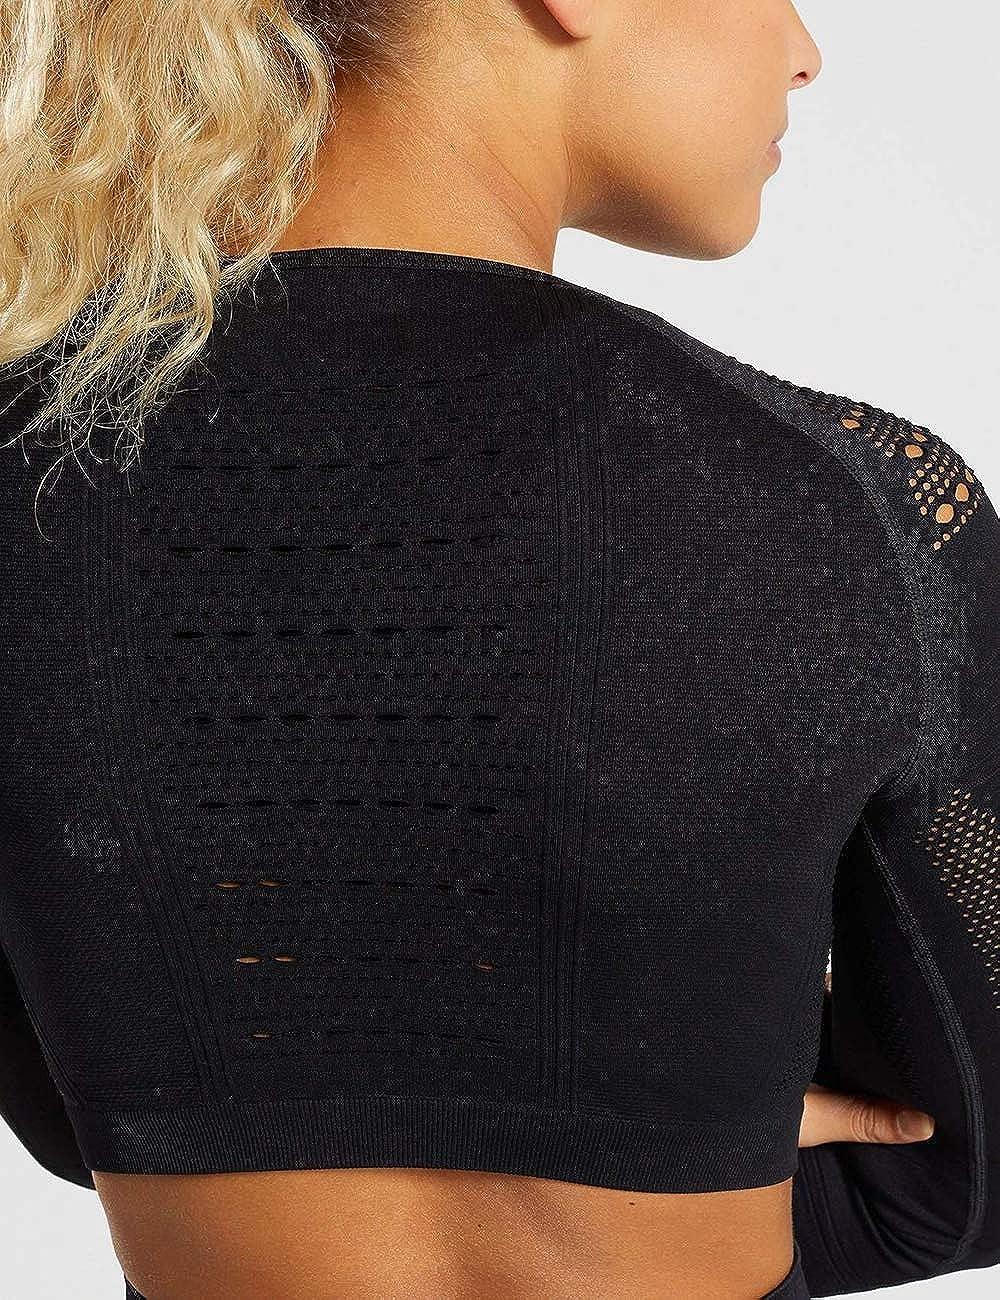 STARBILD Women Seamless Sport Long Sleeve Crop Tops Thumb Hole Fashion Tops Running Workout Gym Tee